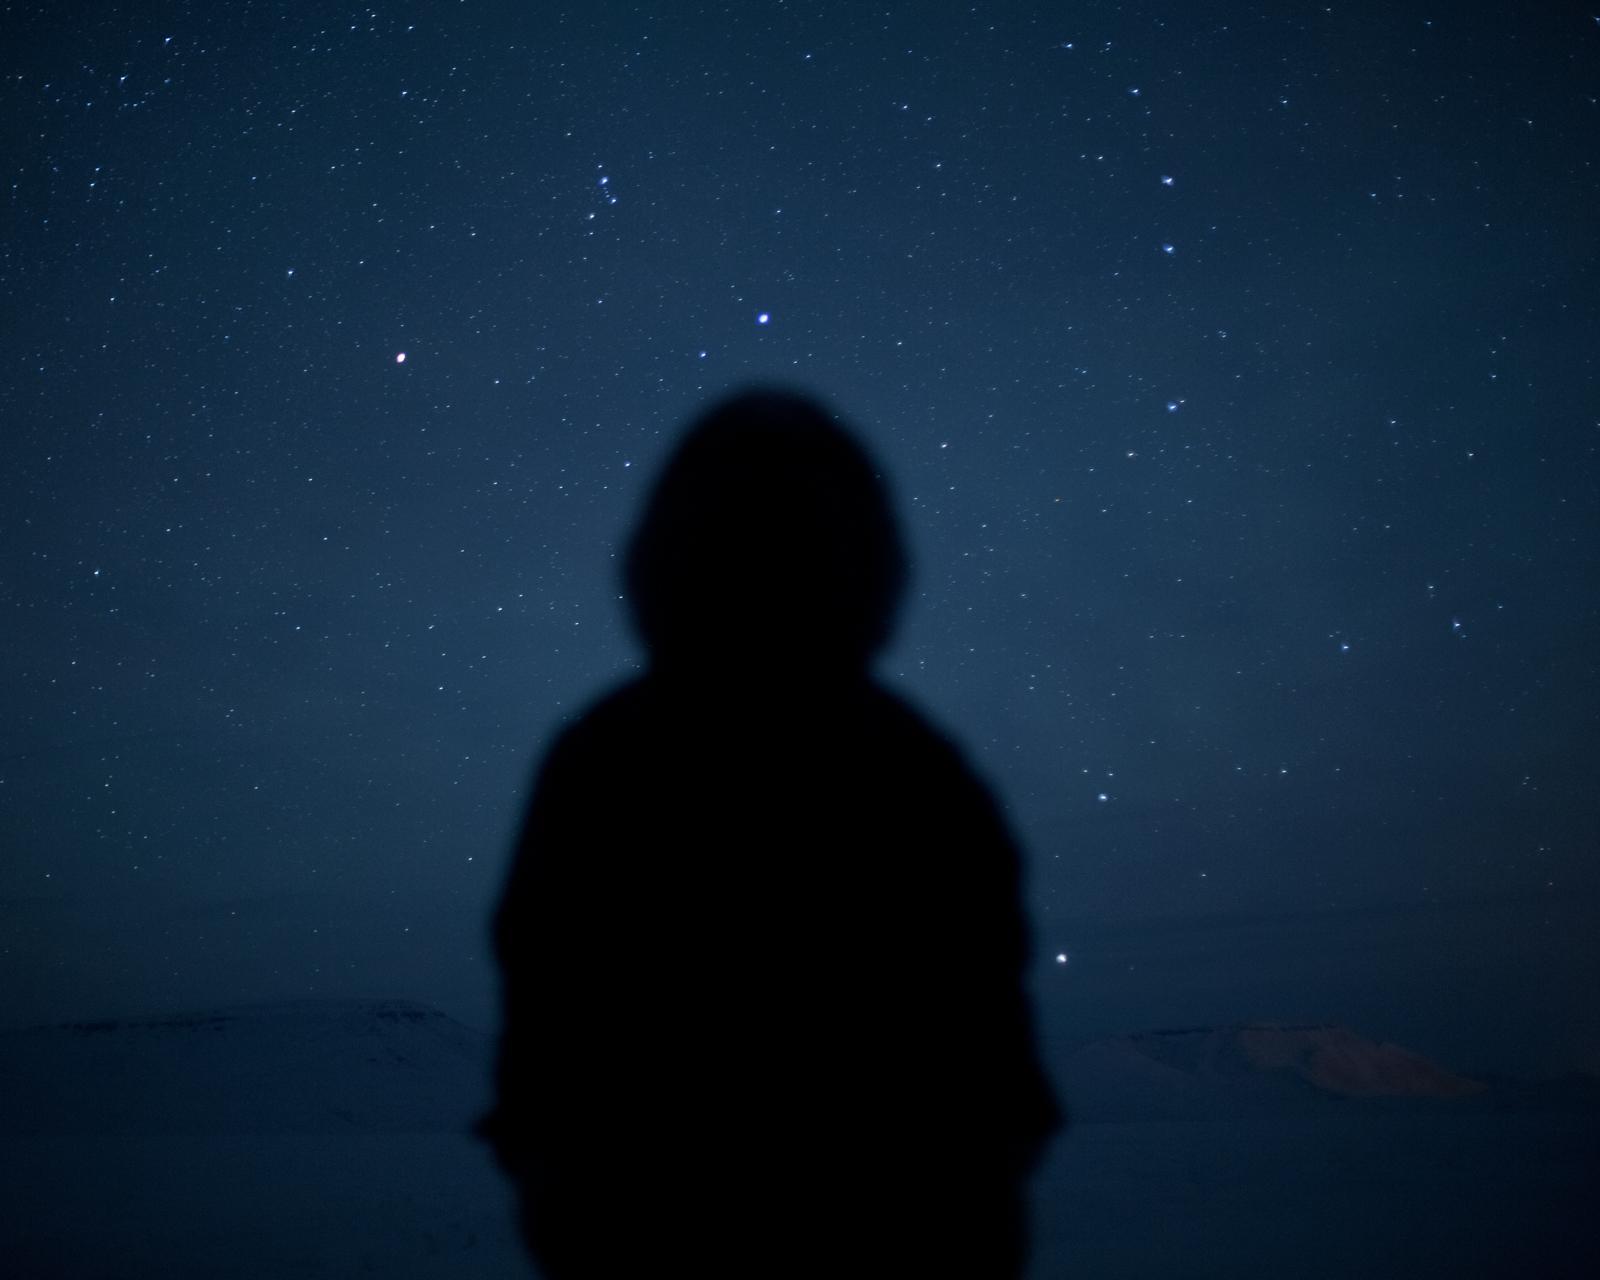 Self-portrait by starlight.